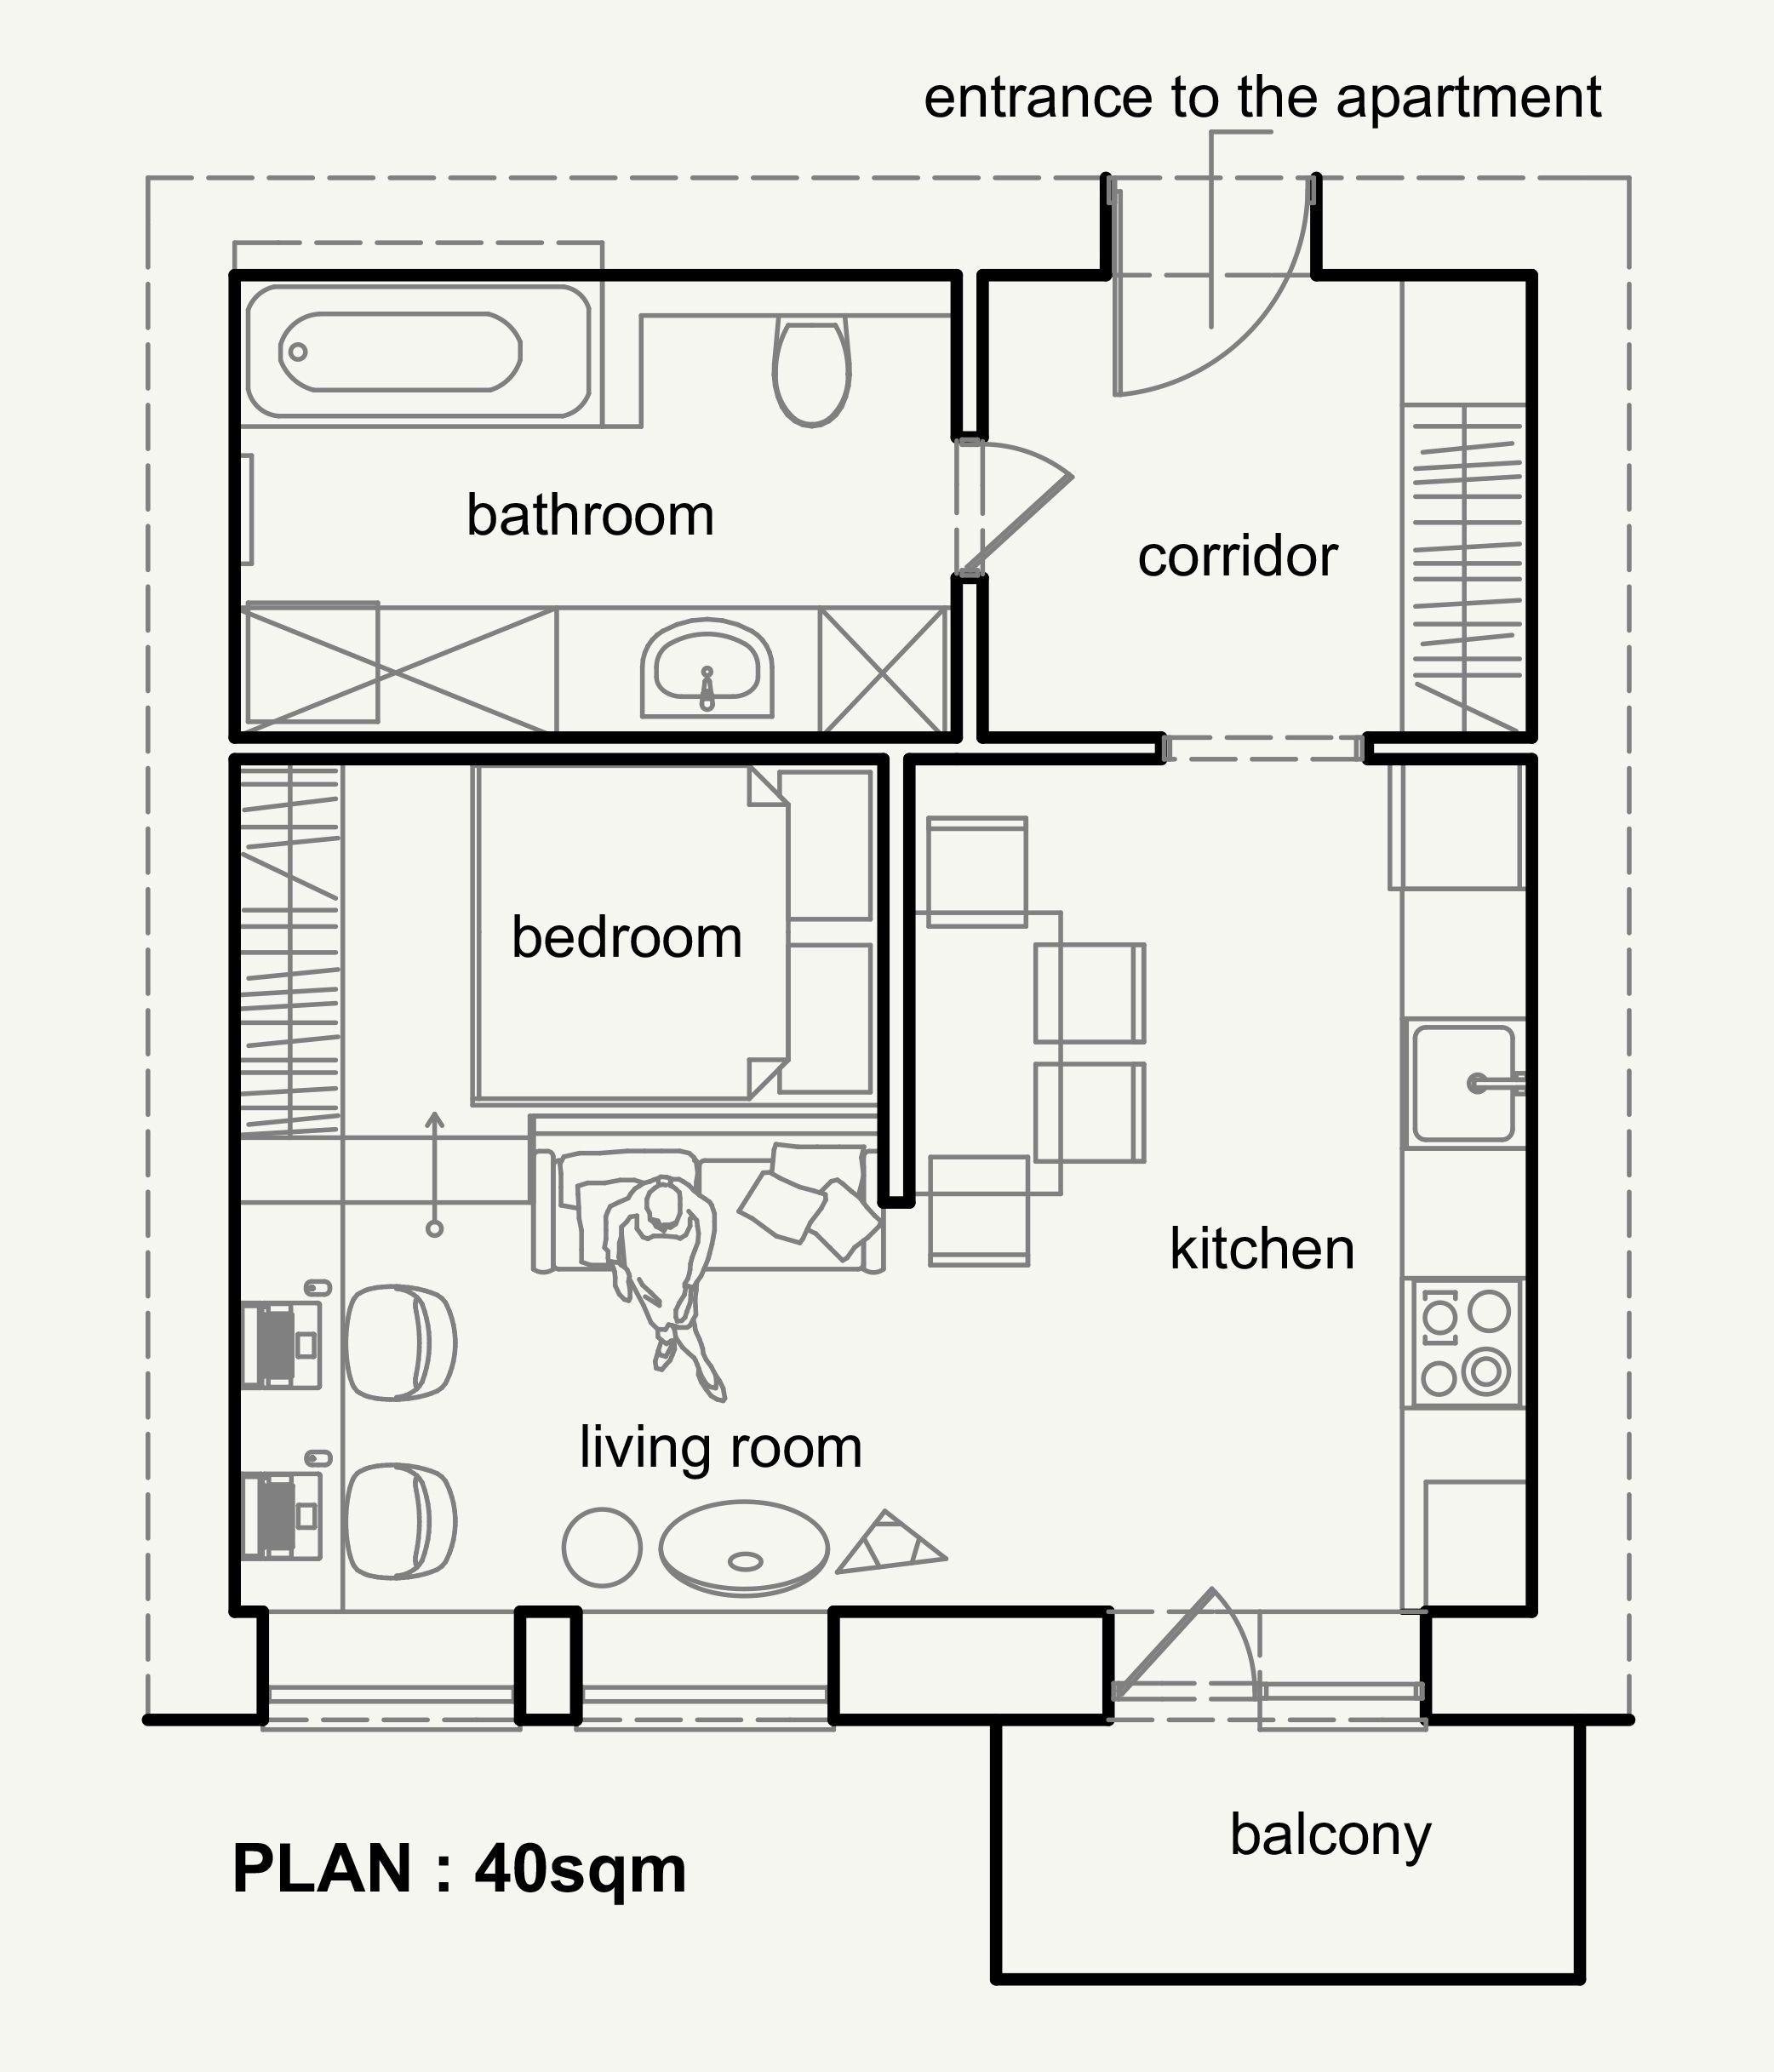 Flat Apartment Definition: This 40 Sq. Meters/430 Sq. Feet Chic Apartment In Lviv